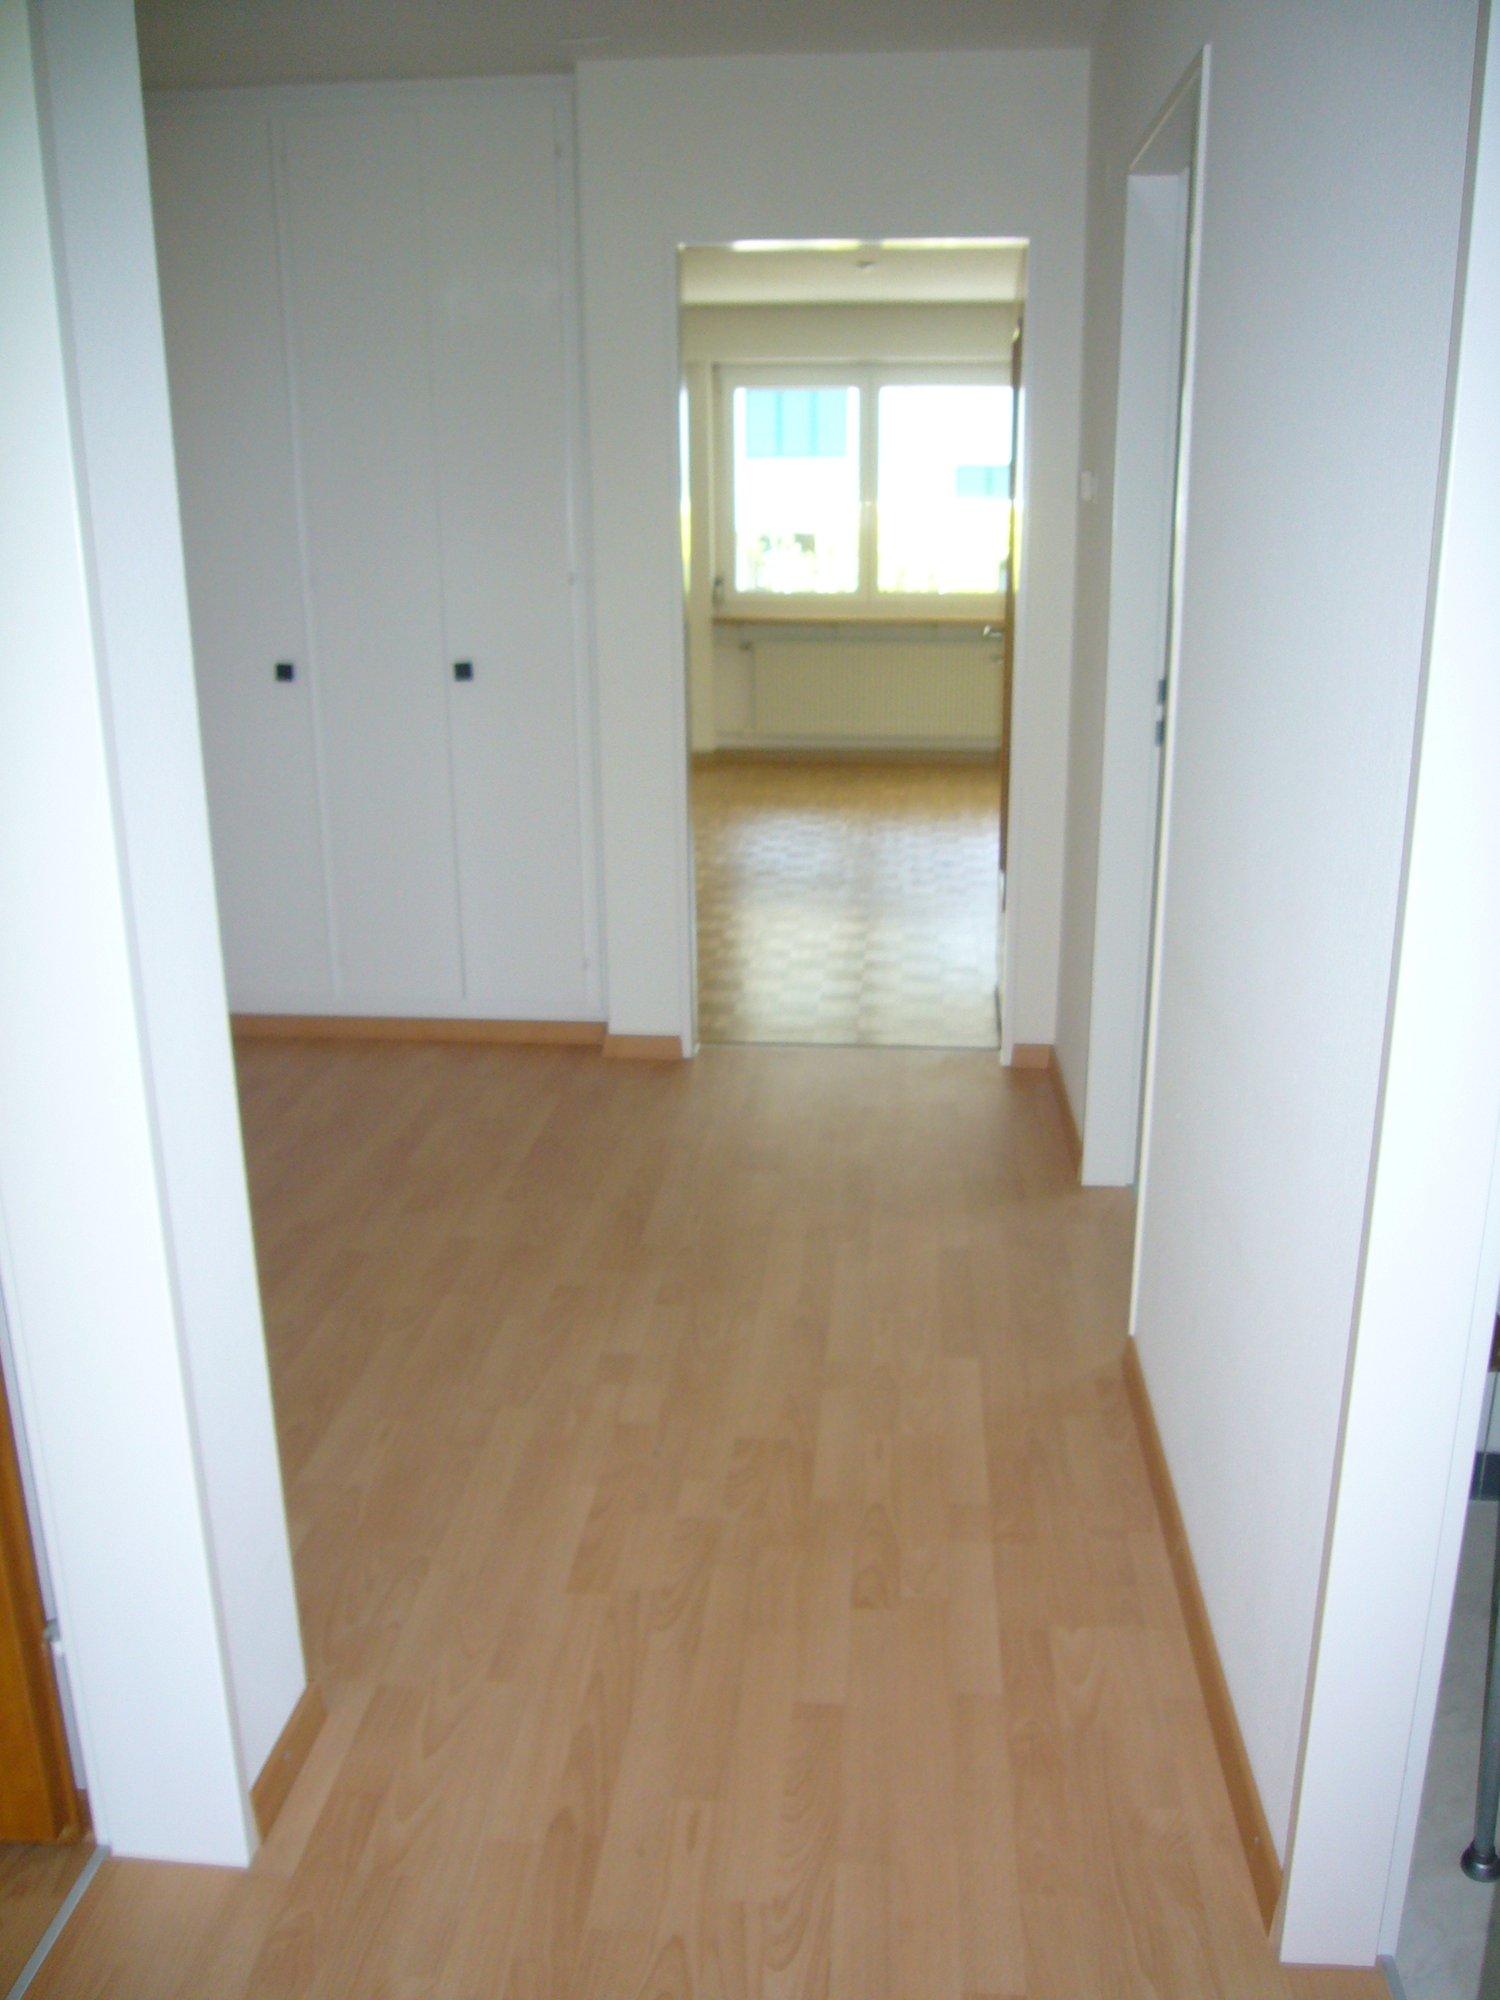 Oberhofstrasse 9